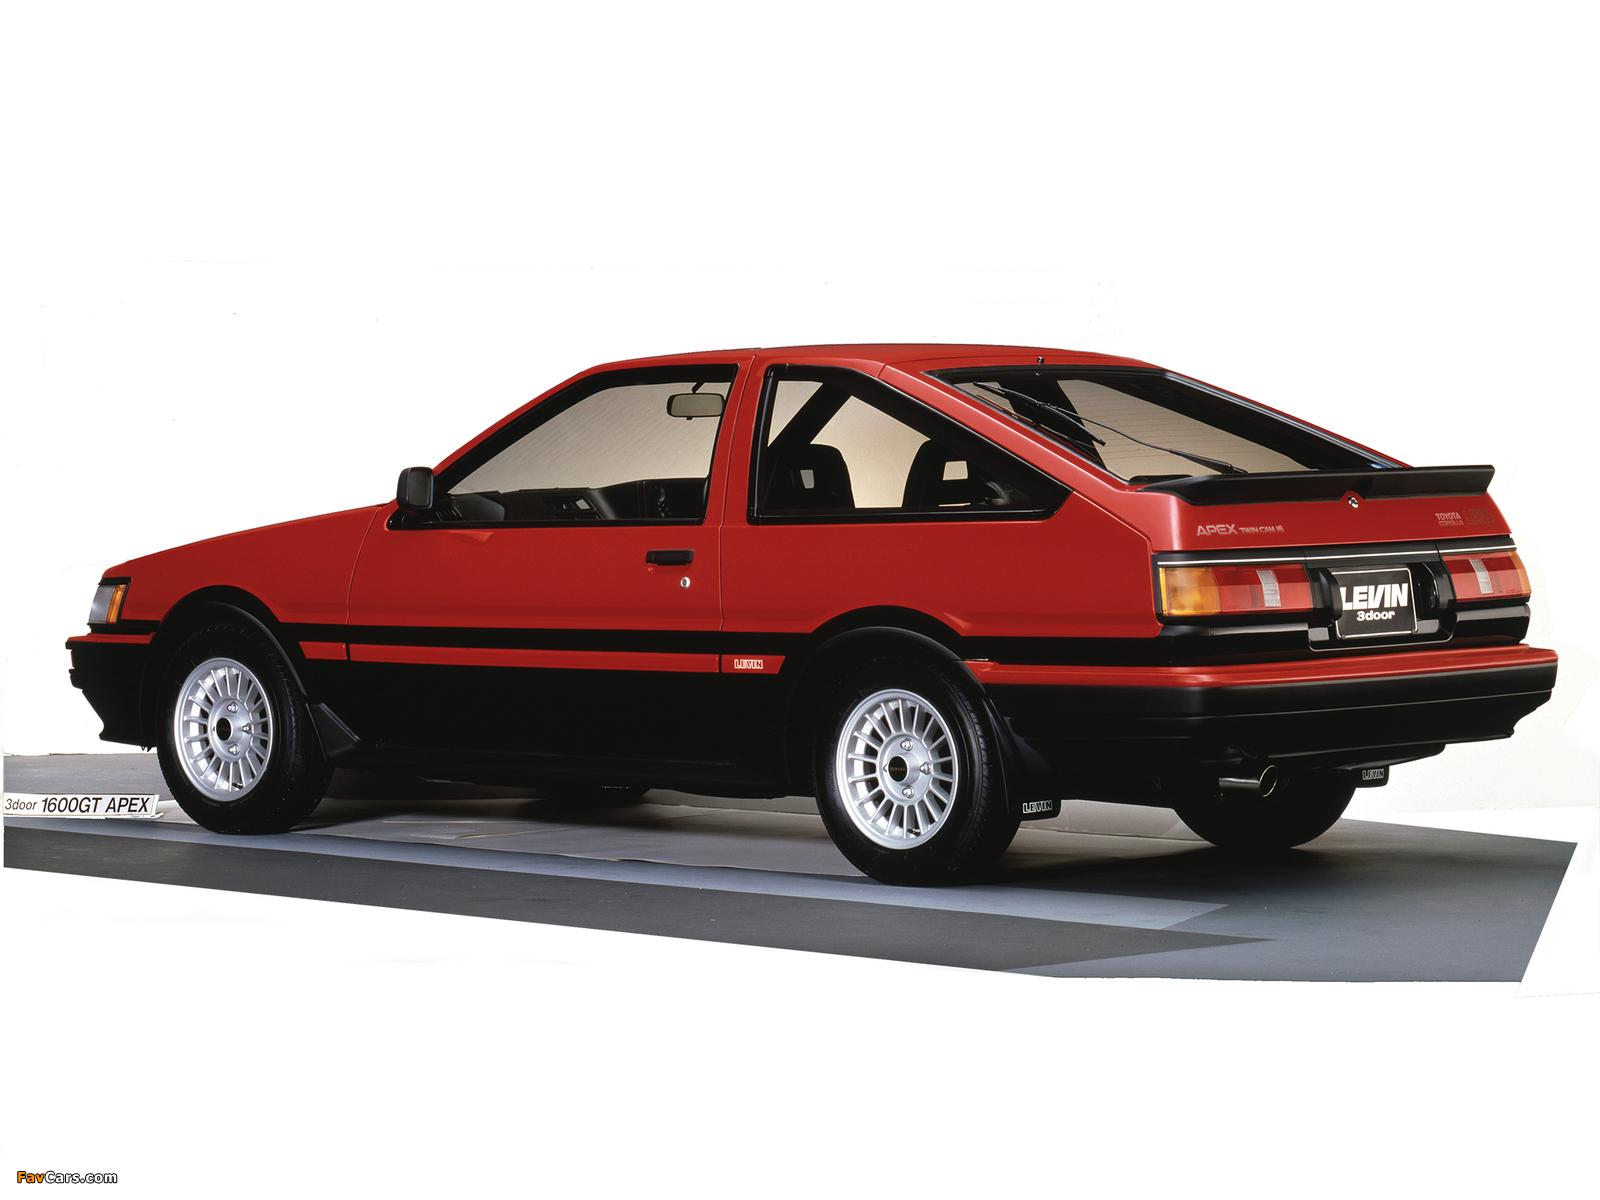 Toyota Corolla 1600 >> Toyota Corolla Levin GT-Apex 3-door (AE86) 1985–87 wallpapers (1600x1200)